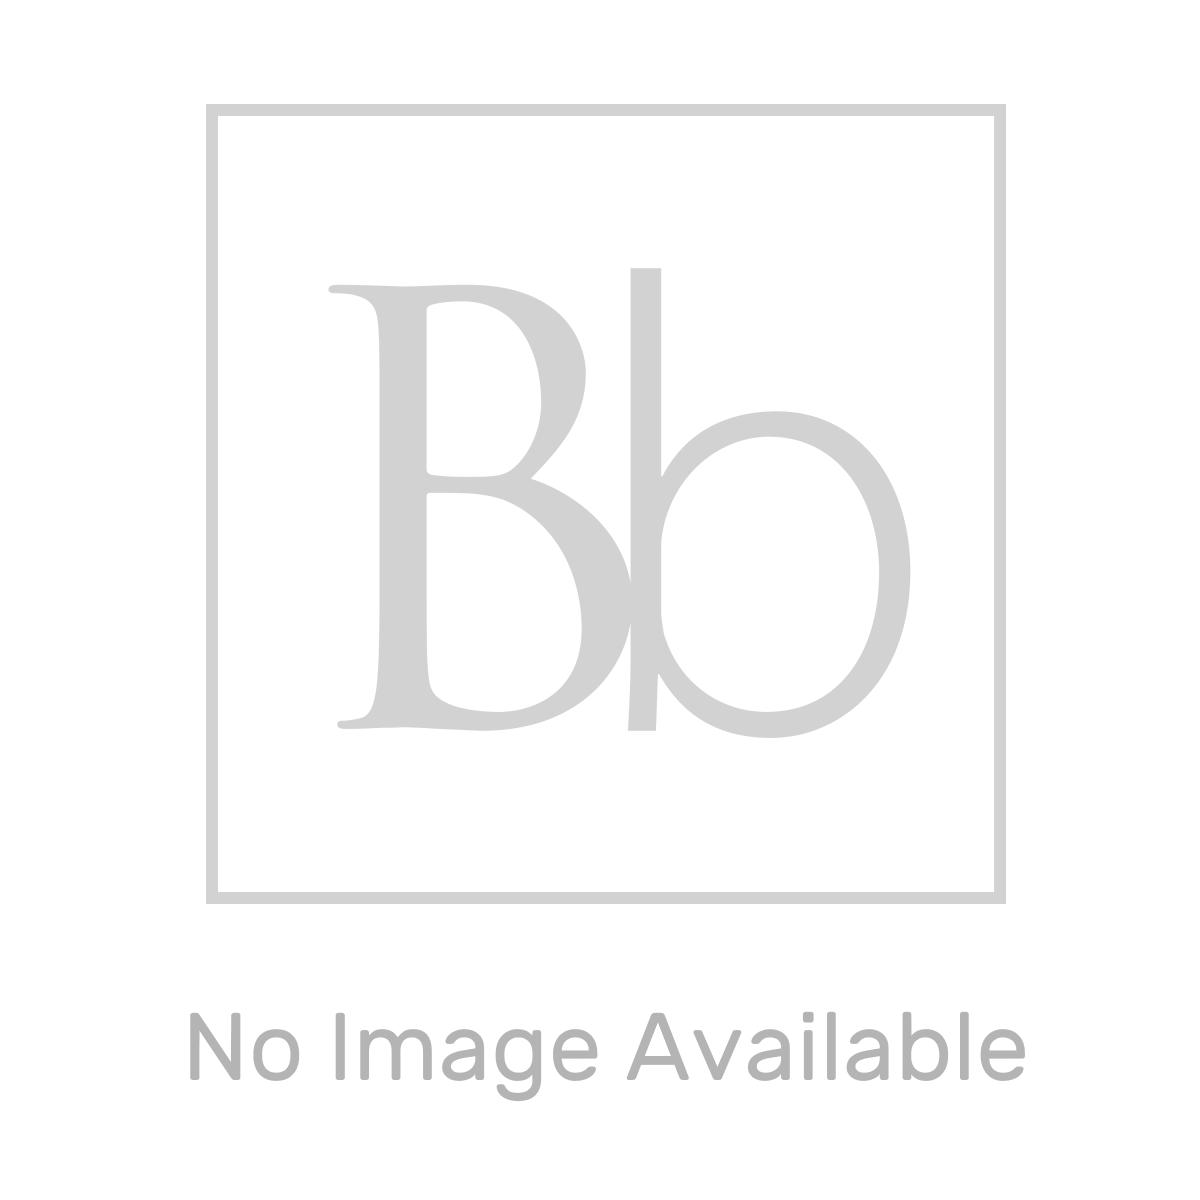 Nuie Bailey Bath Filler Tap